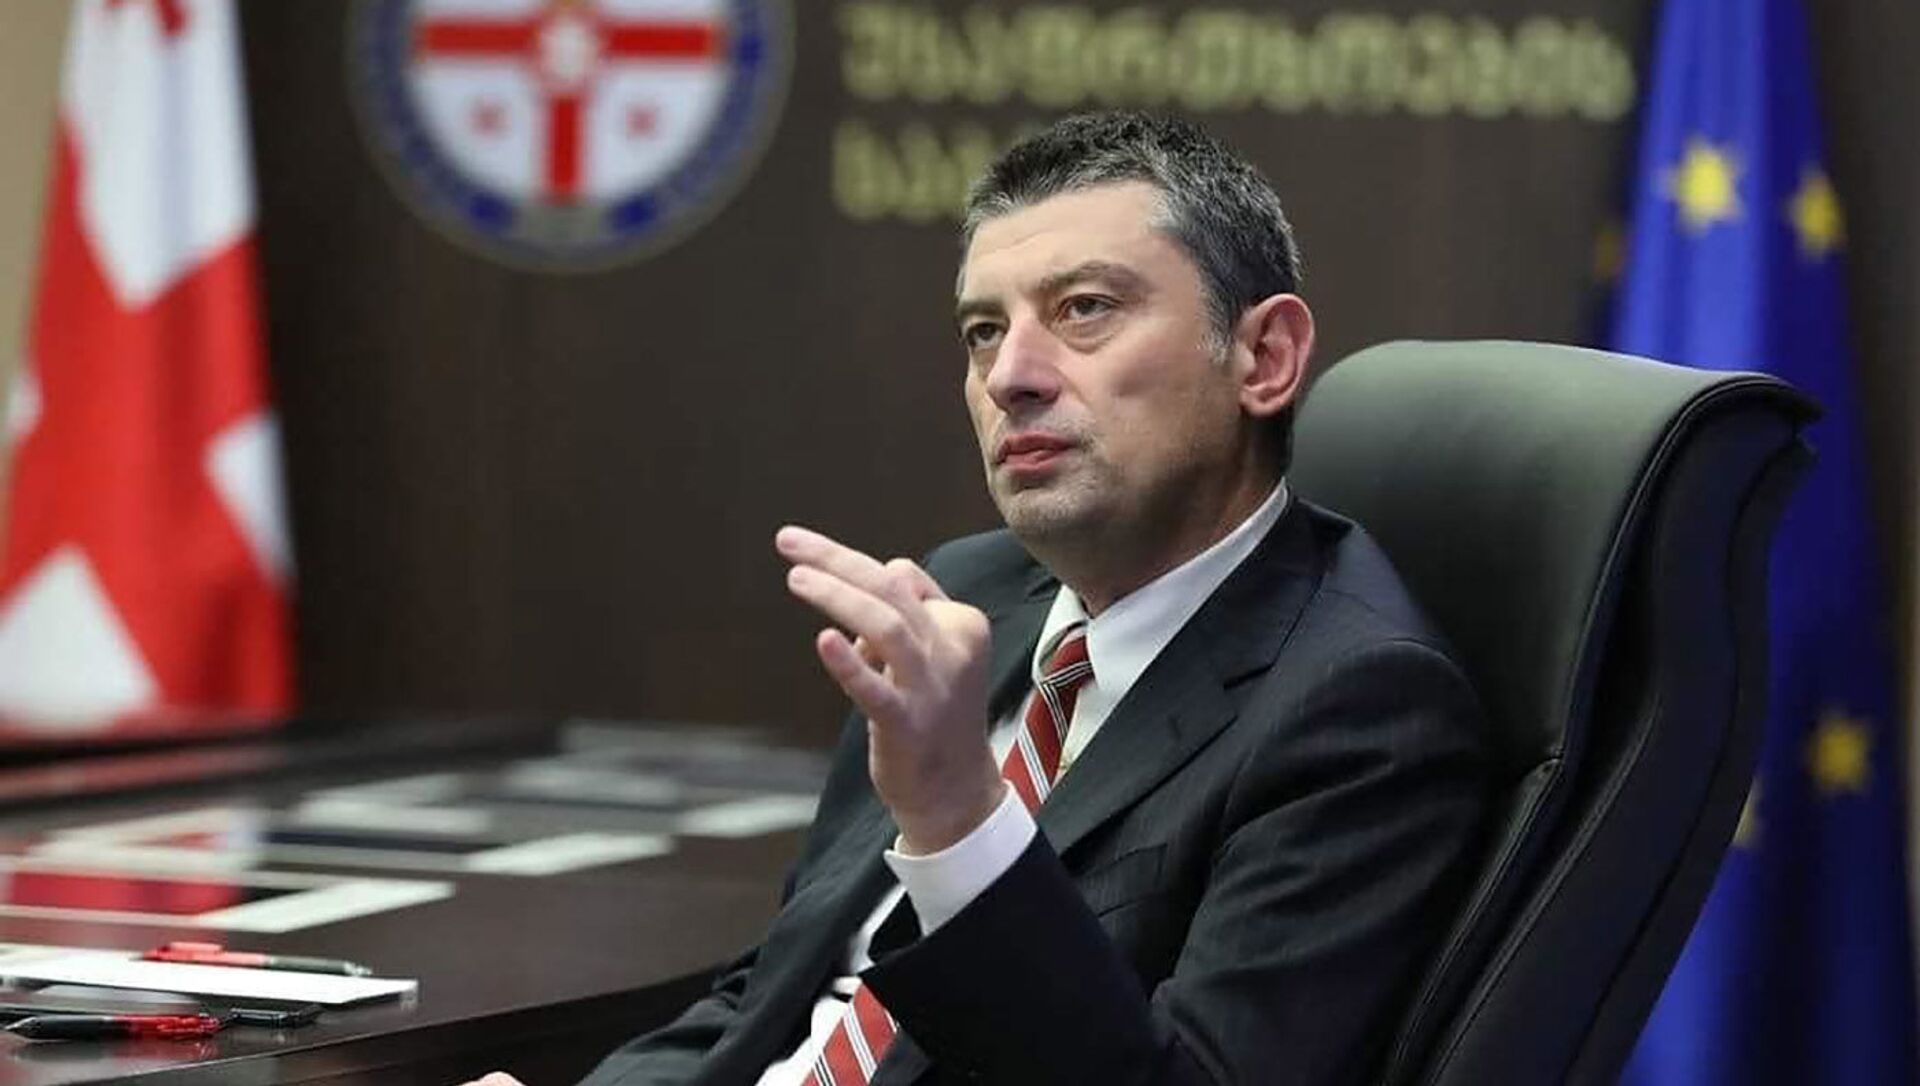 Георгий Гахария - Sputnik Грузия, 1920, 22.05.2021